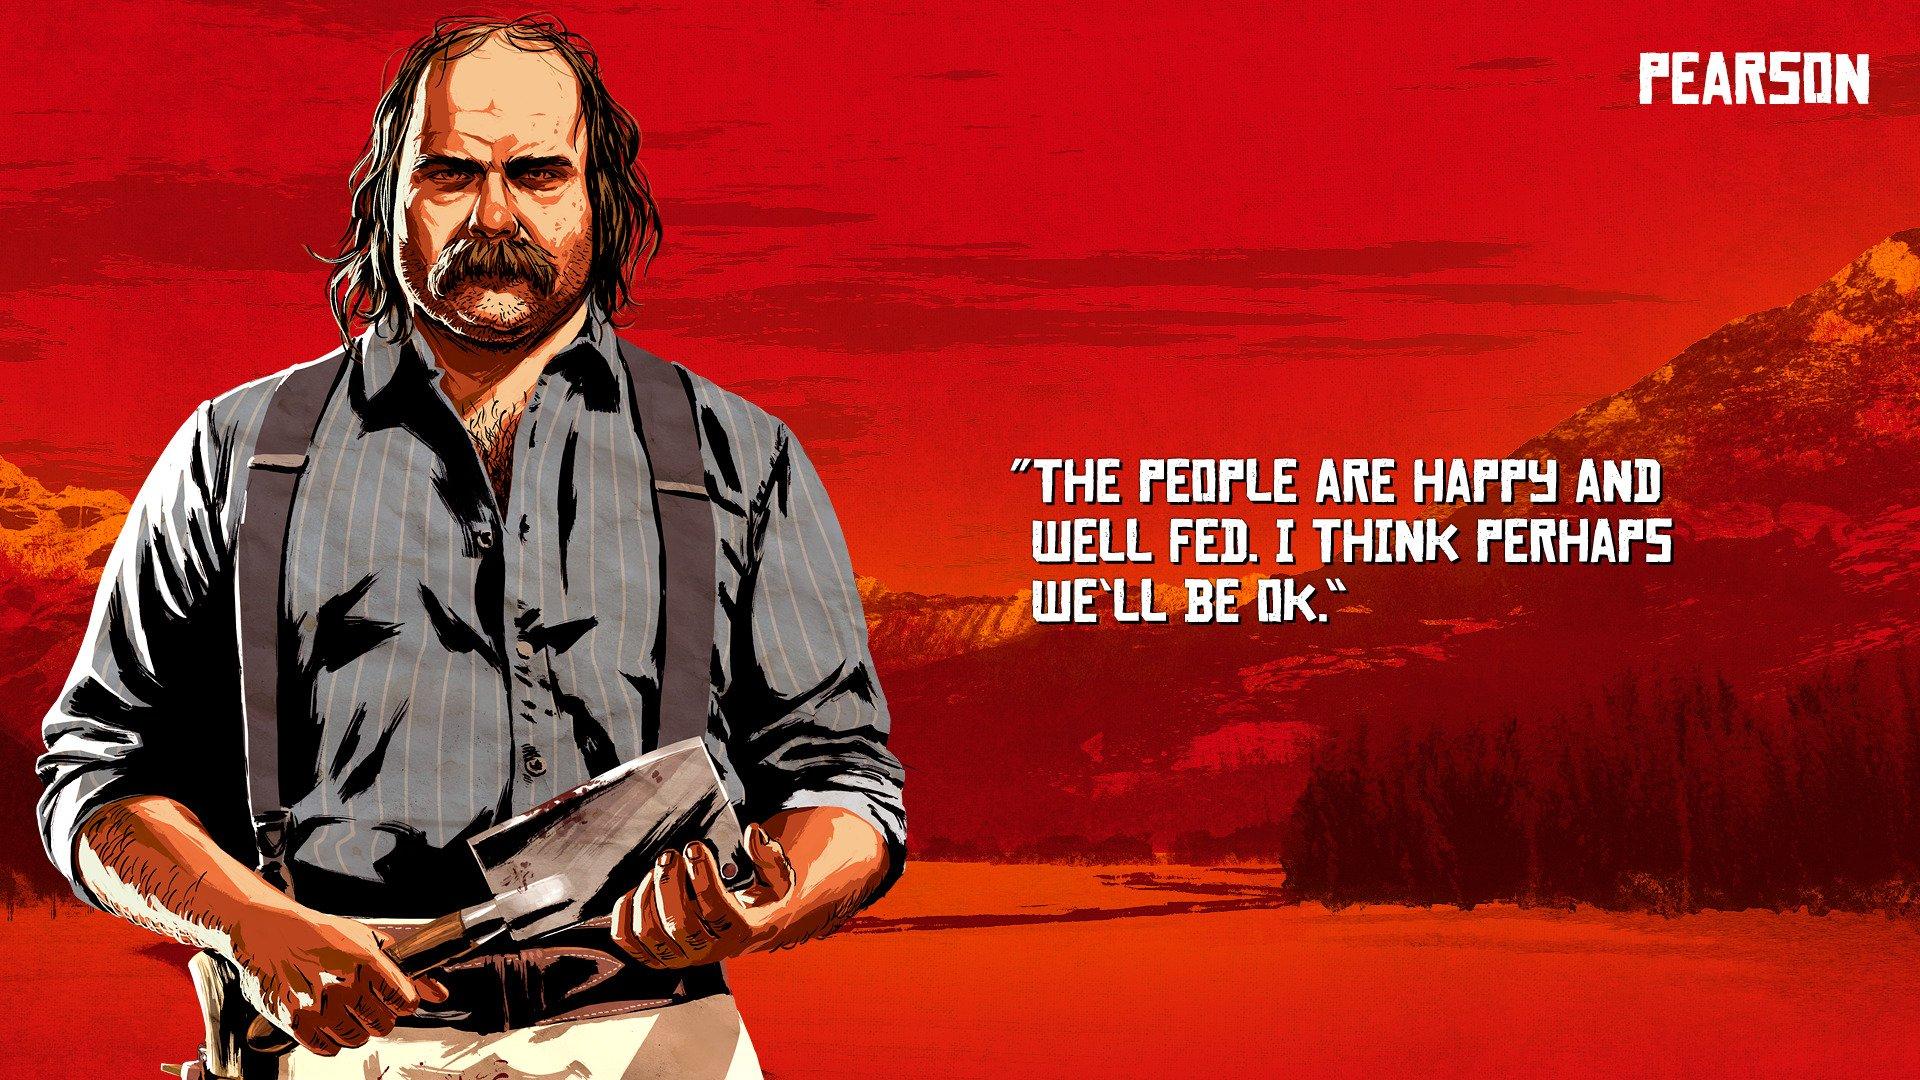 Rockstar Games revela artes dos personagens de Red Dead Redemption 2; veja 13